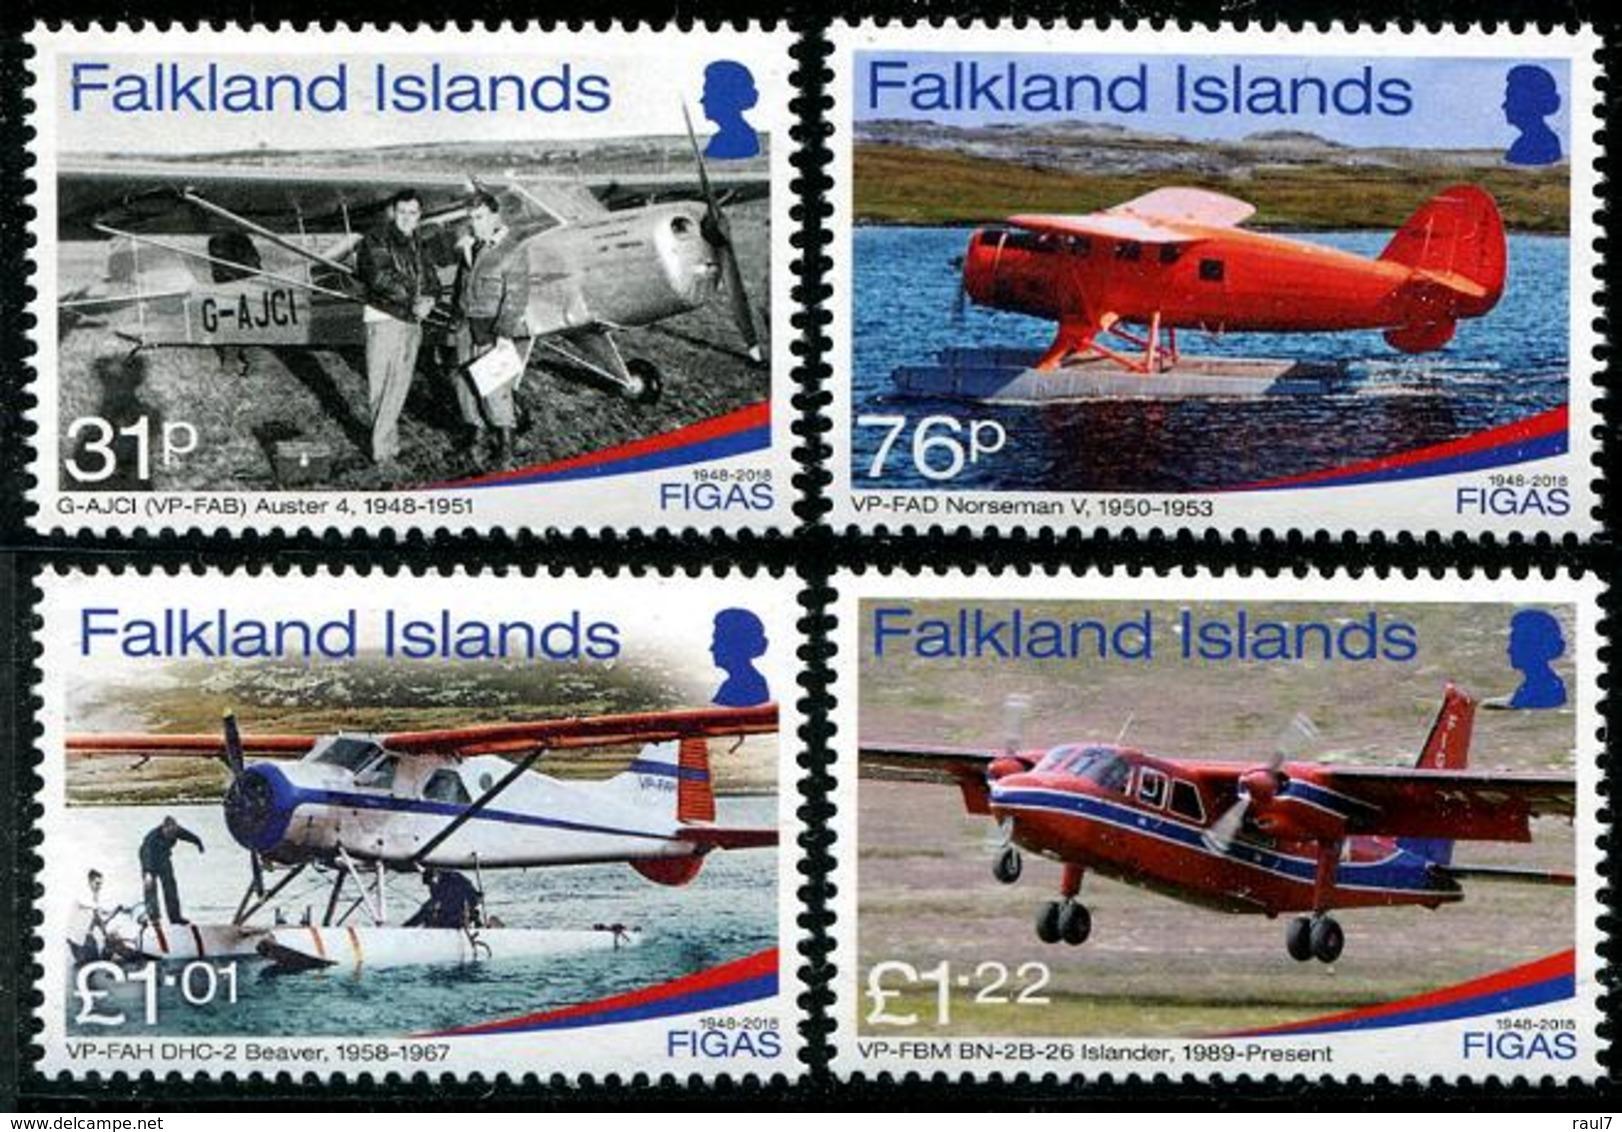 Falkland 2018 - FIGAS, Avions De Transport Aux Iles Falkland - 4 Val Neufs // Mnh - Falkland